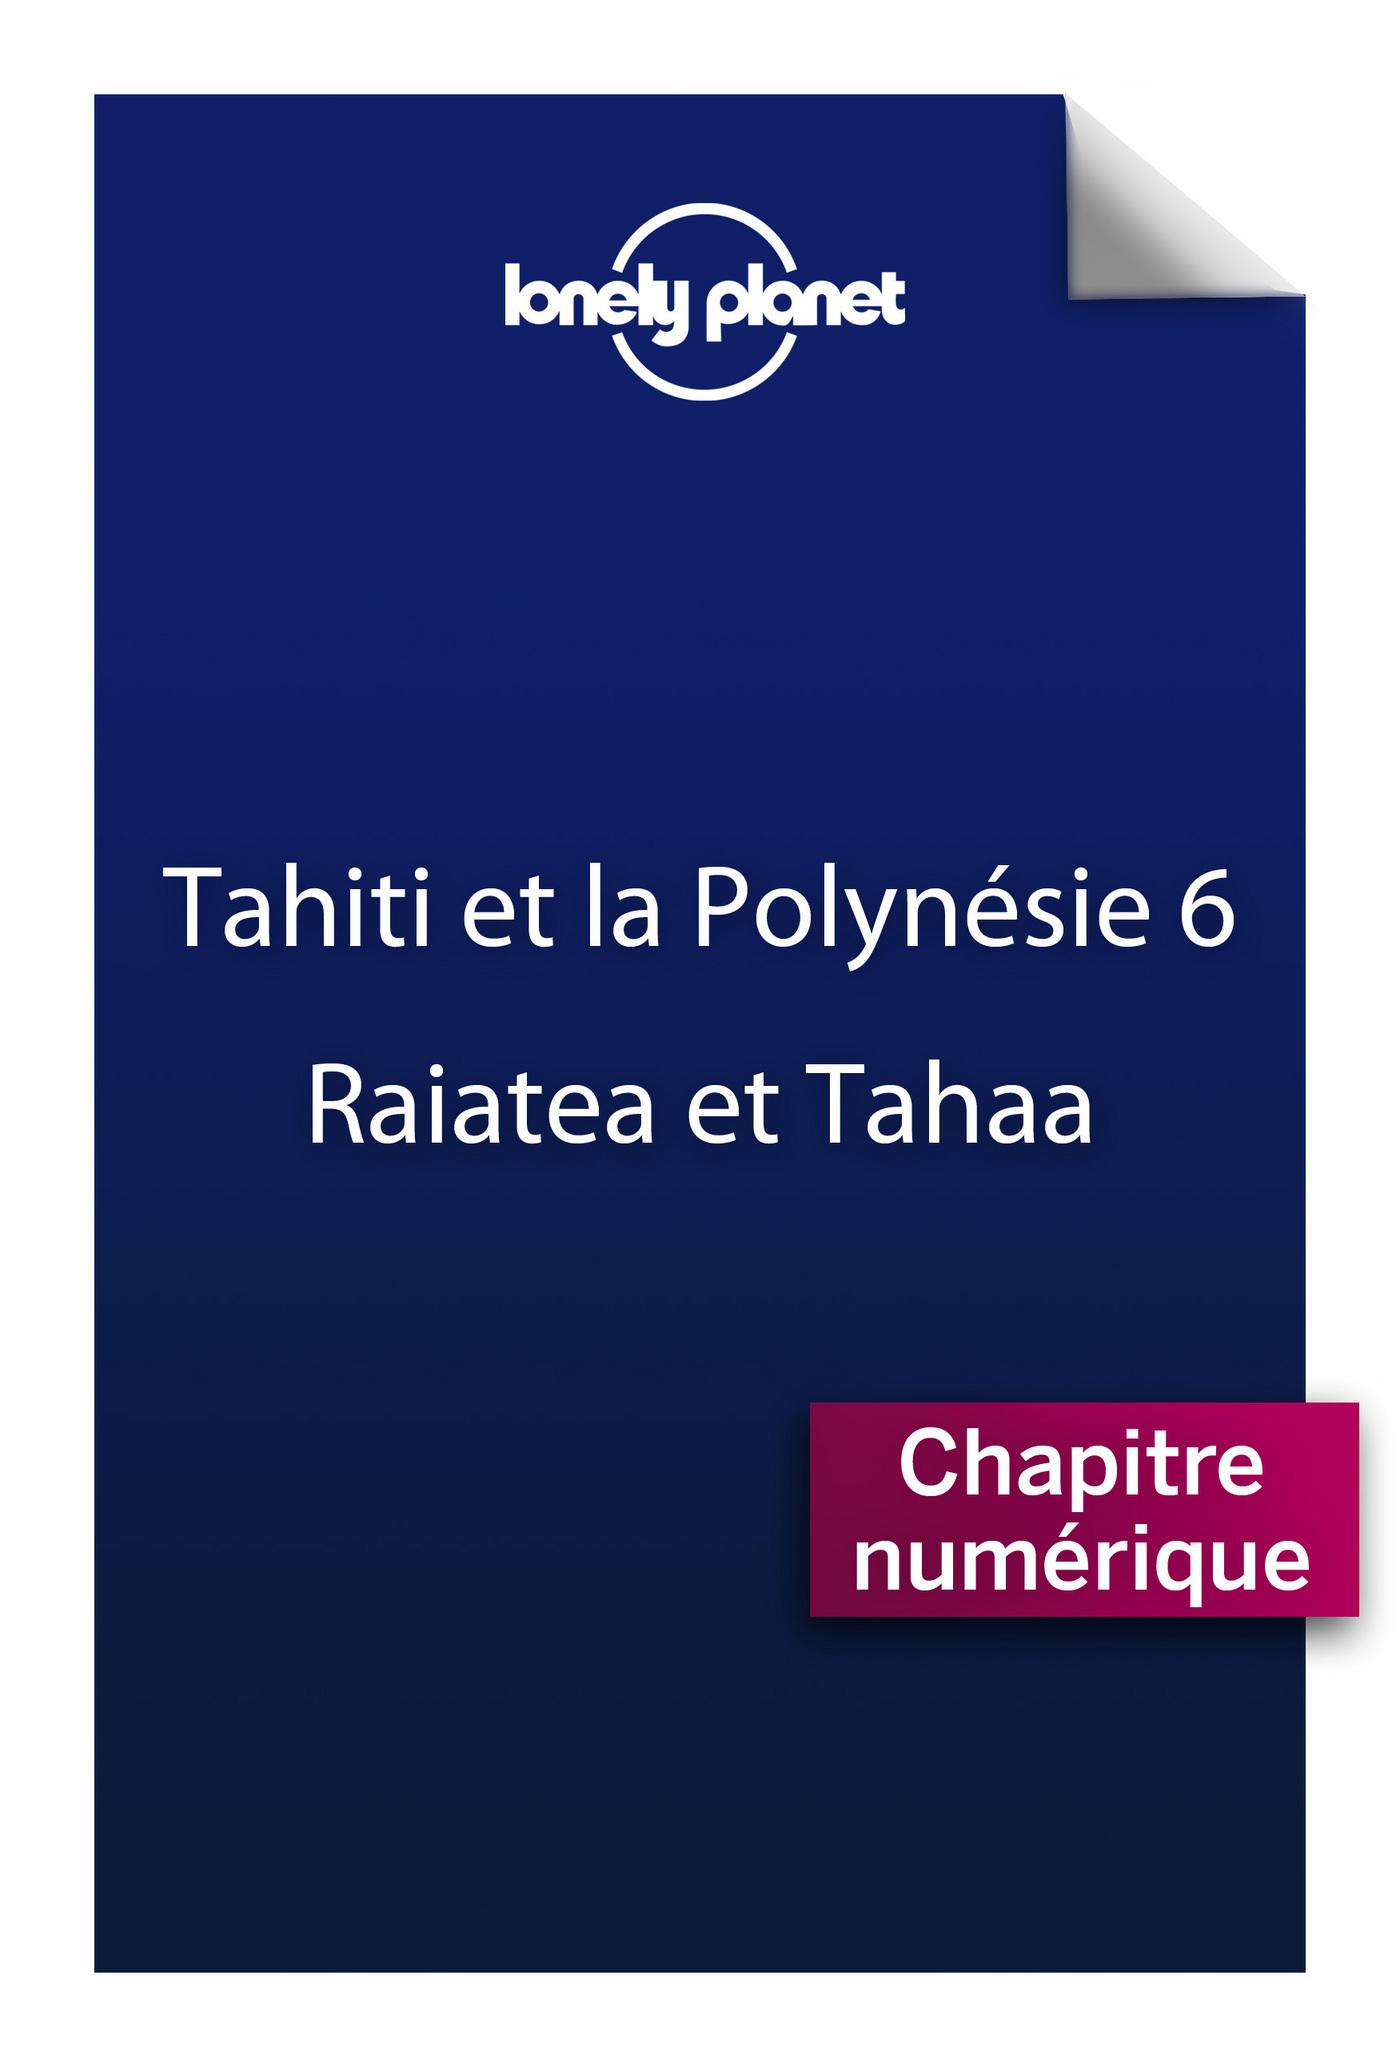 Tahiti 6 - Raiatea et Tahaa